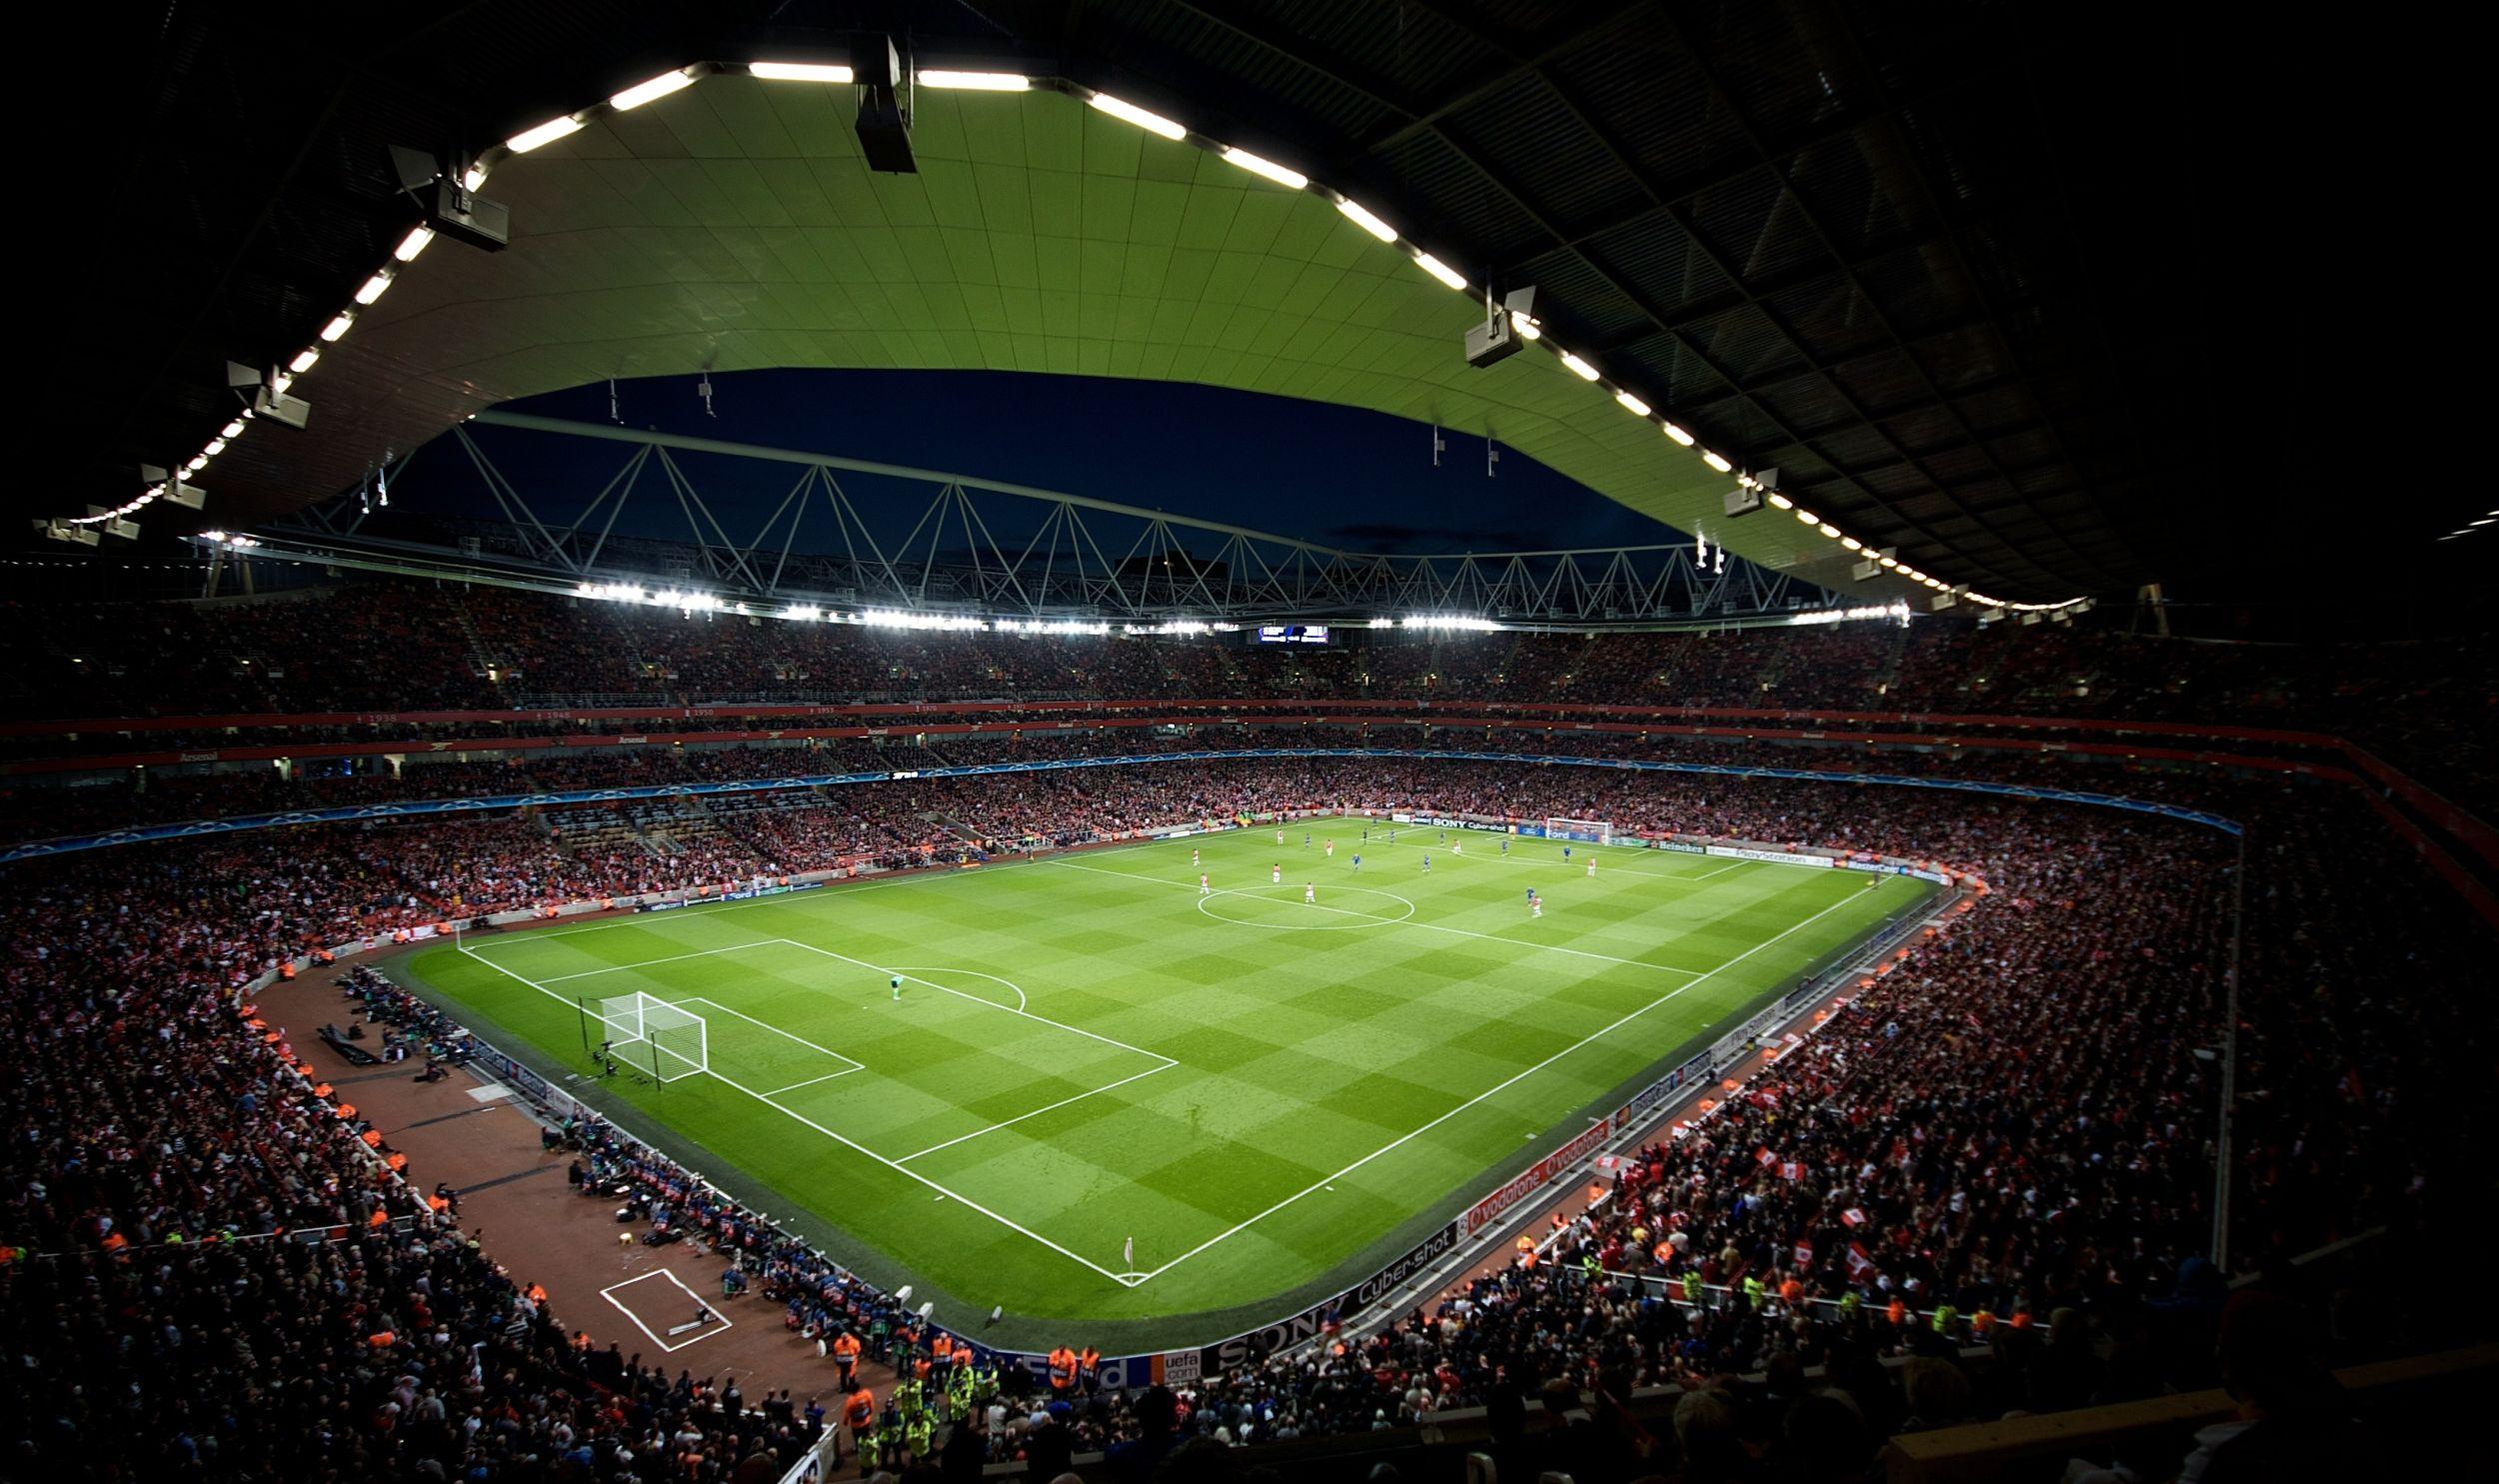 audience-stadium-champions-league-football-photo-wallpaper